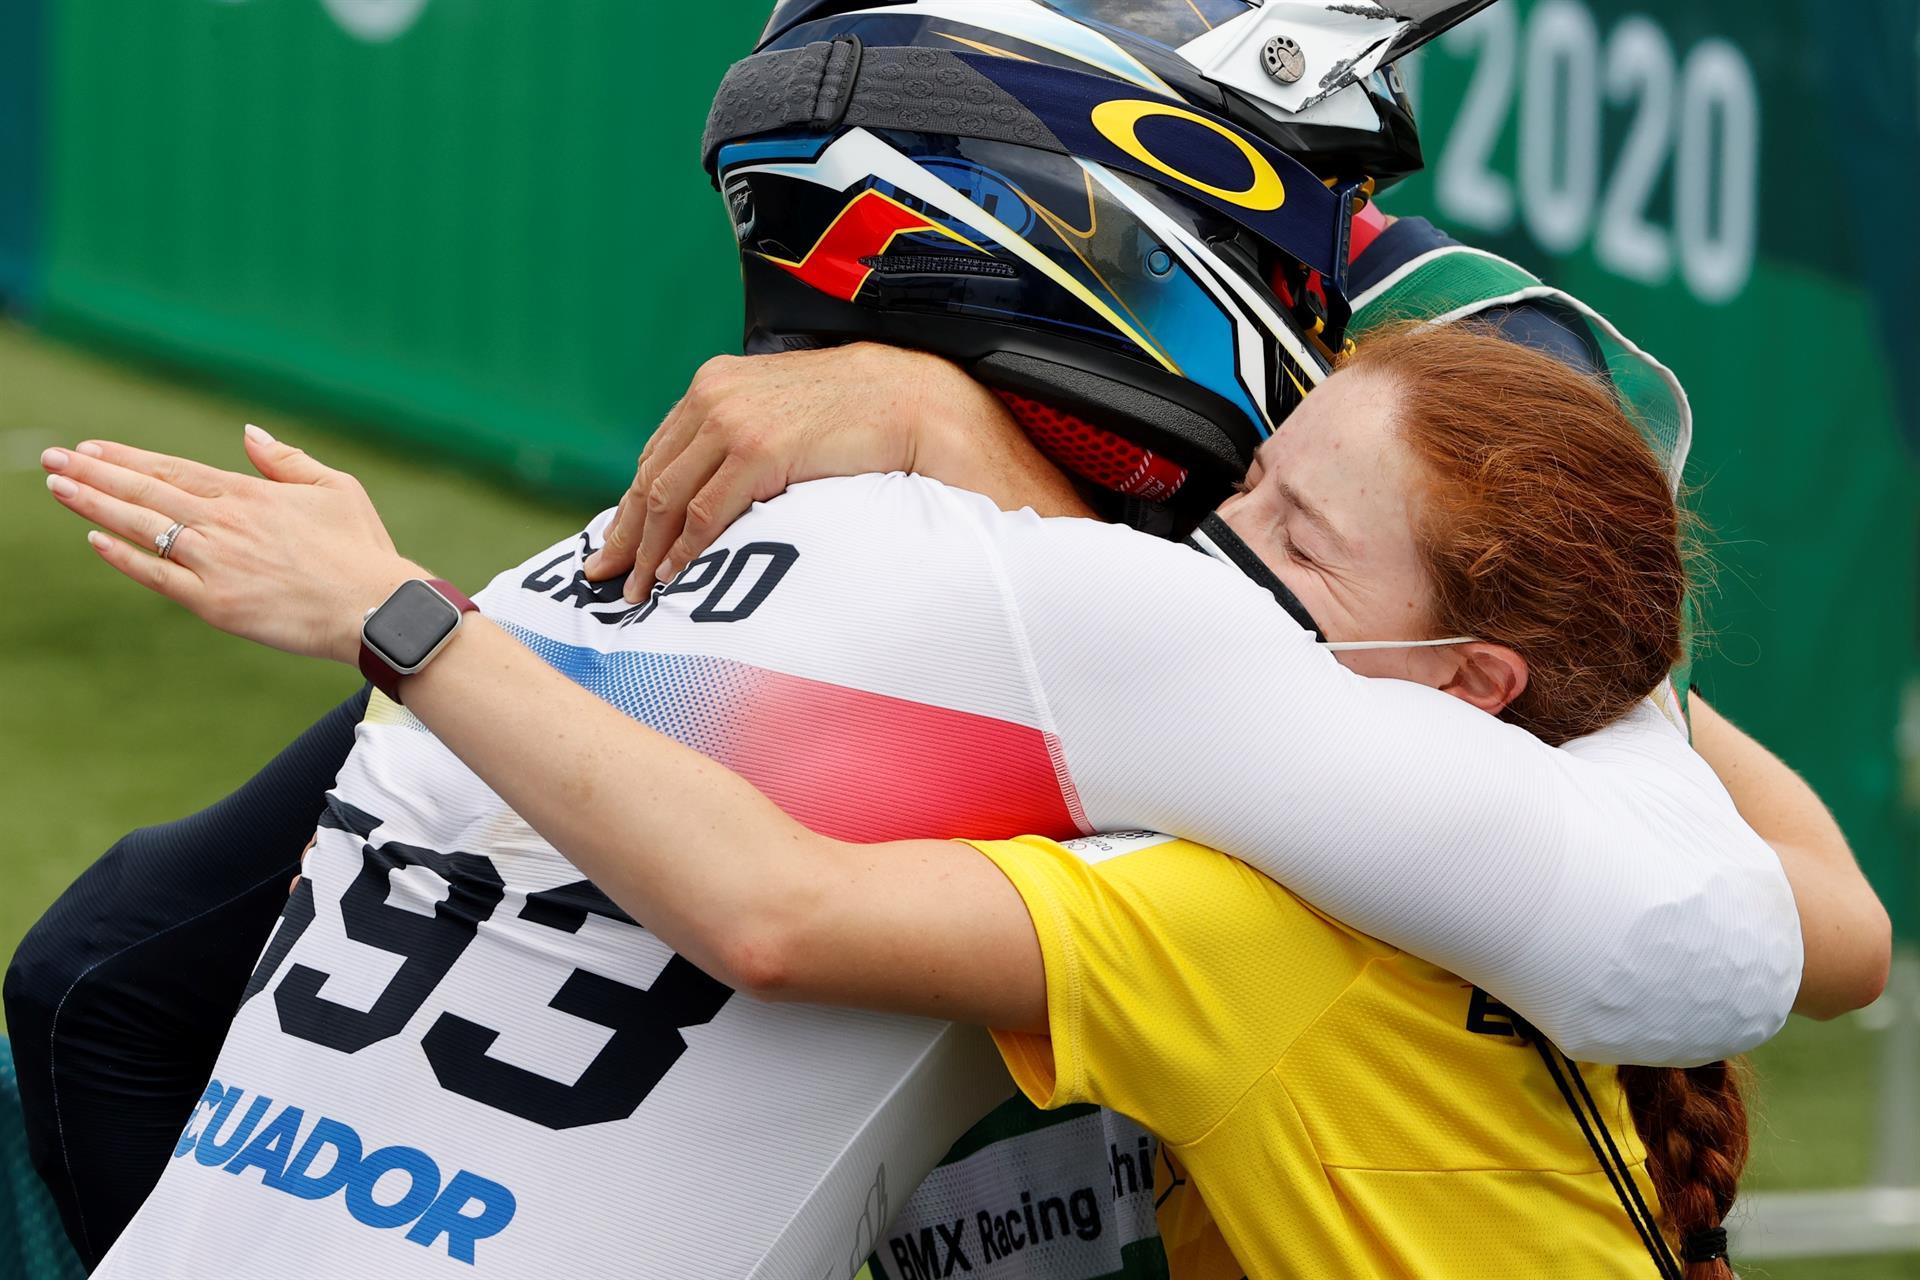 Ecuador gana diploma olímpico con el ciclista Alfredo Campo en BMX Racing